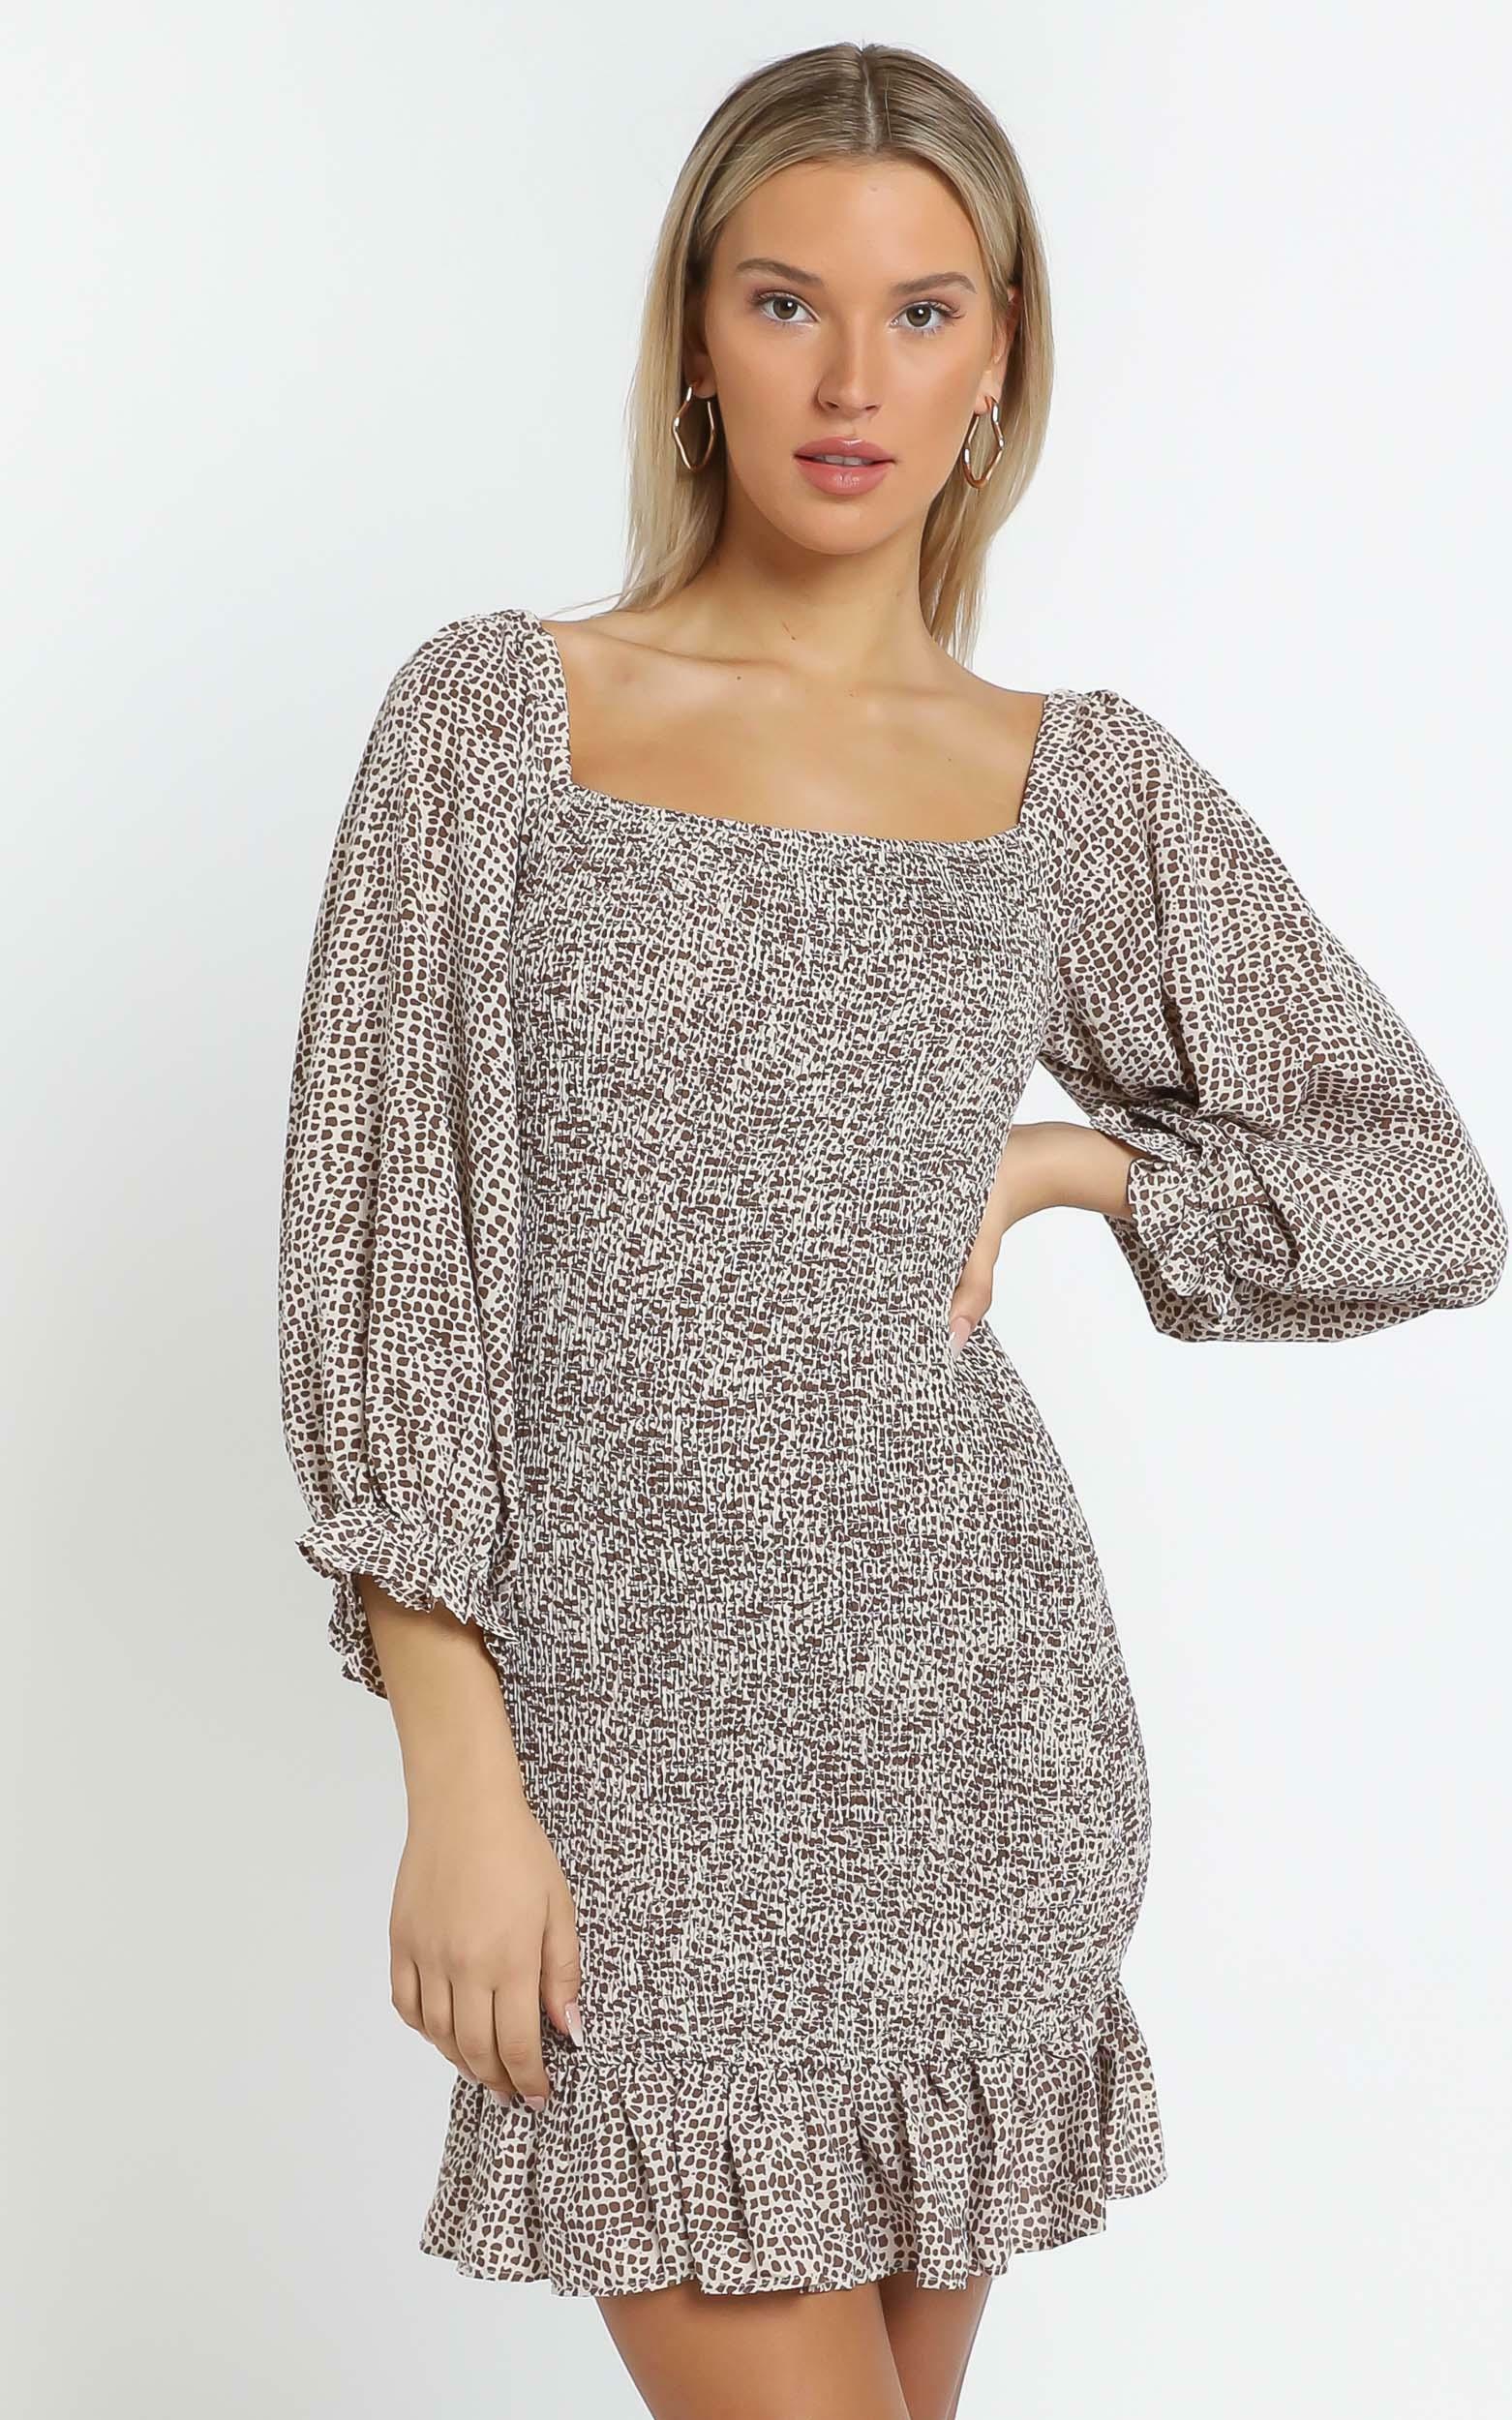 Meg Dress in Choc Spot - 14 (XL), Brown, hi-res image number null